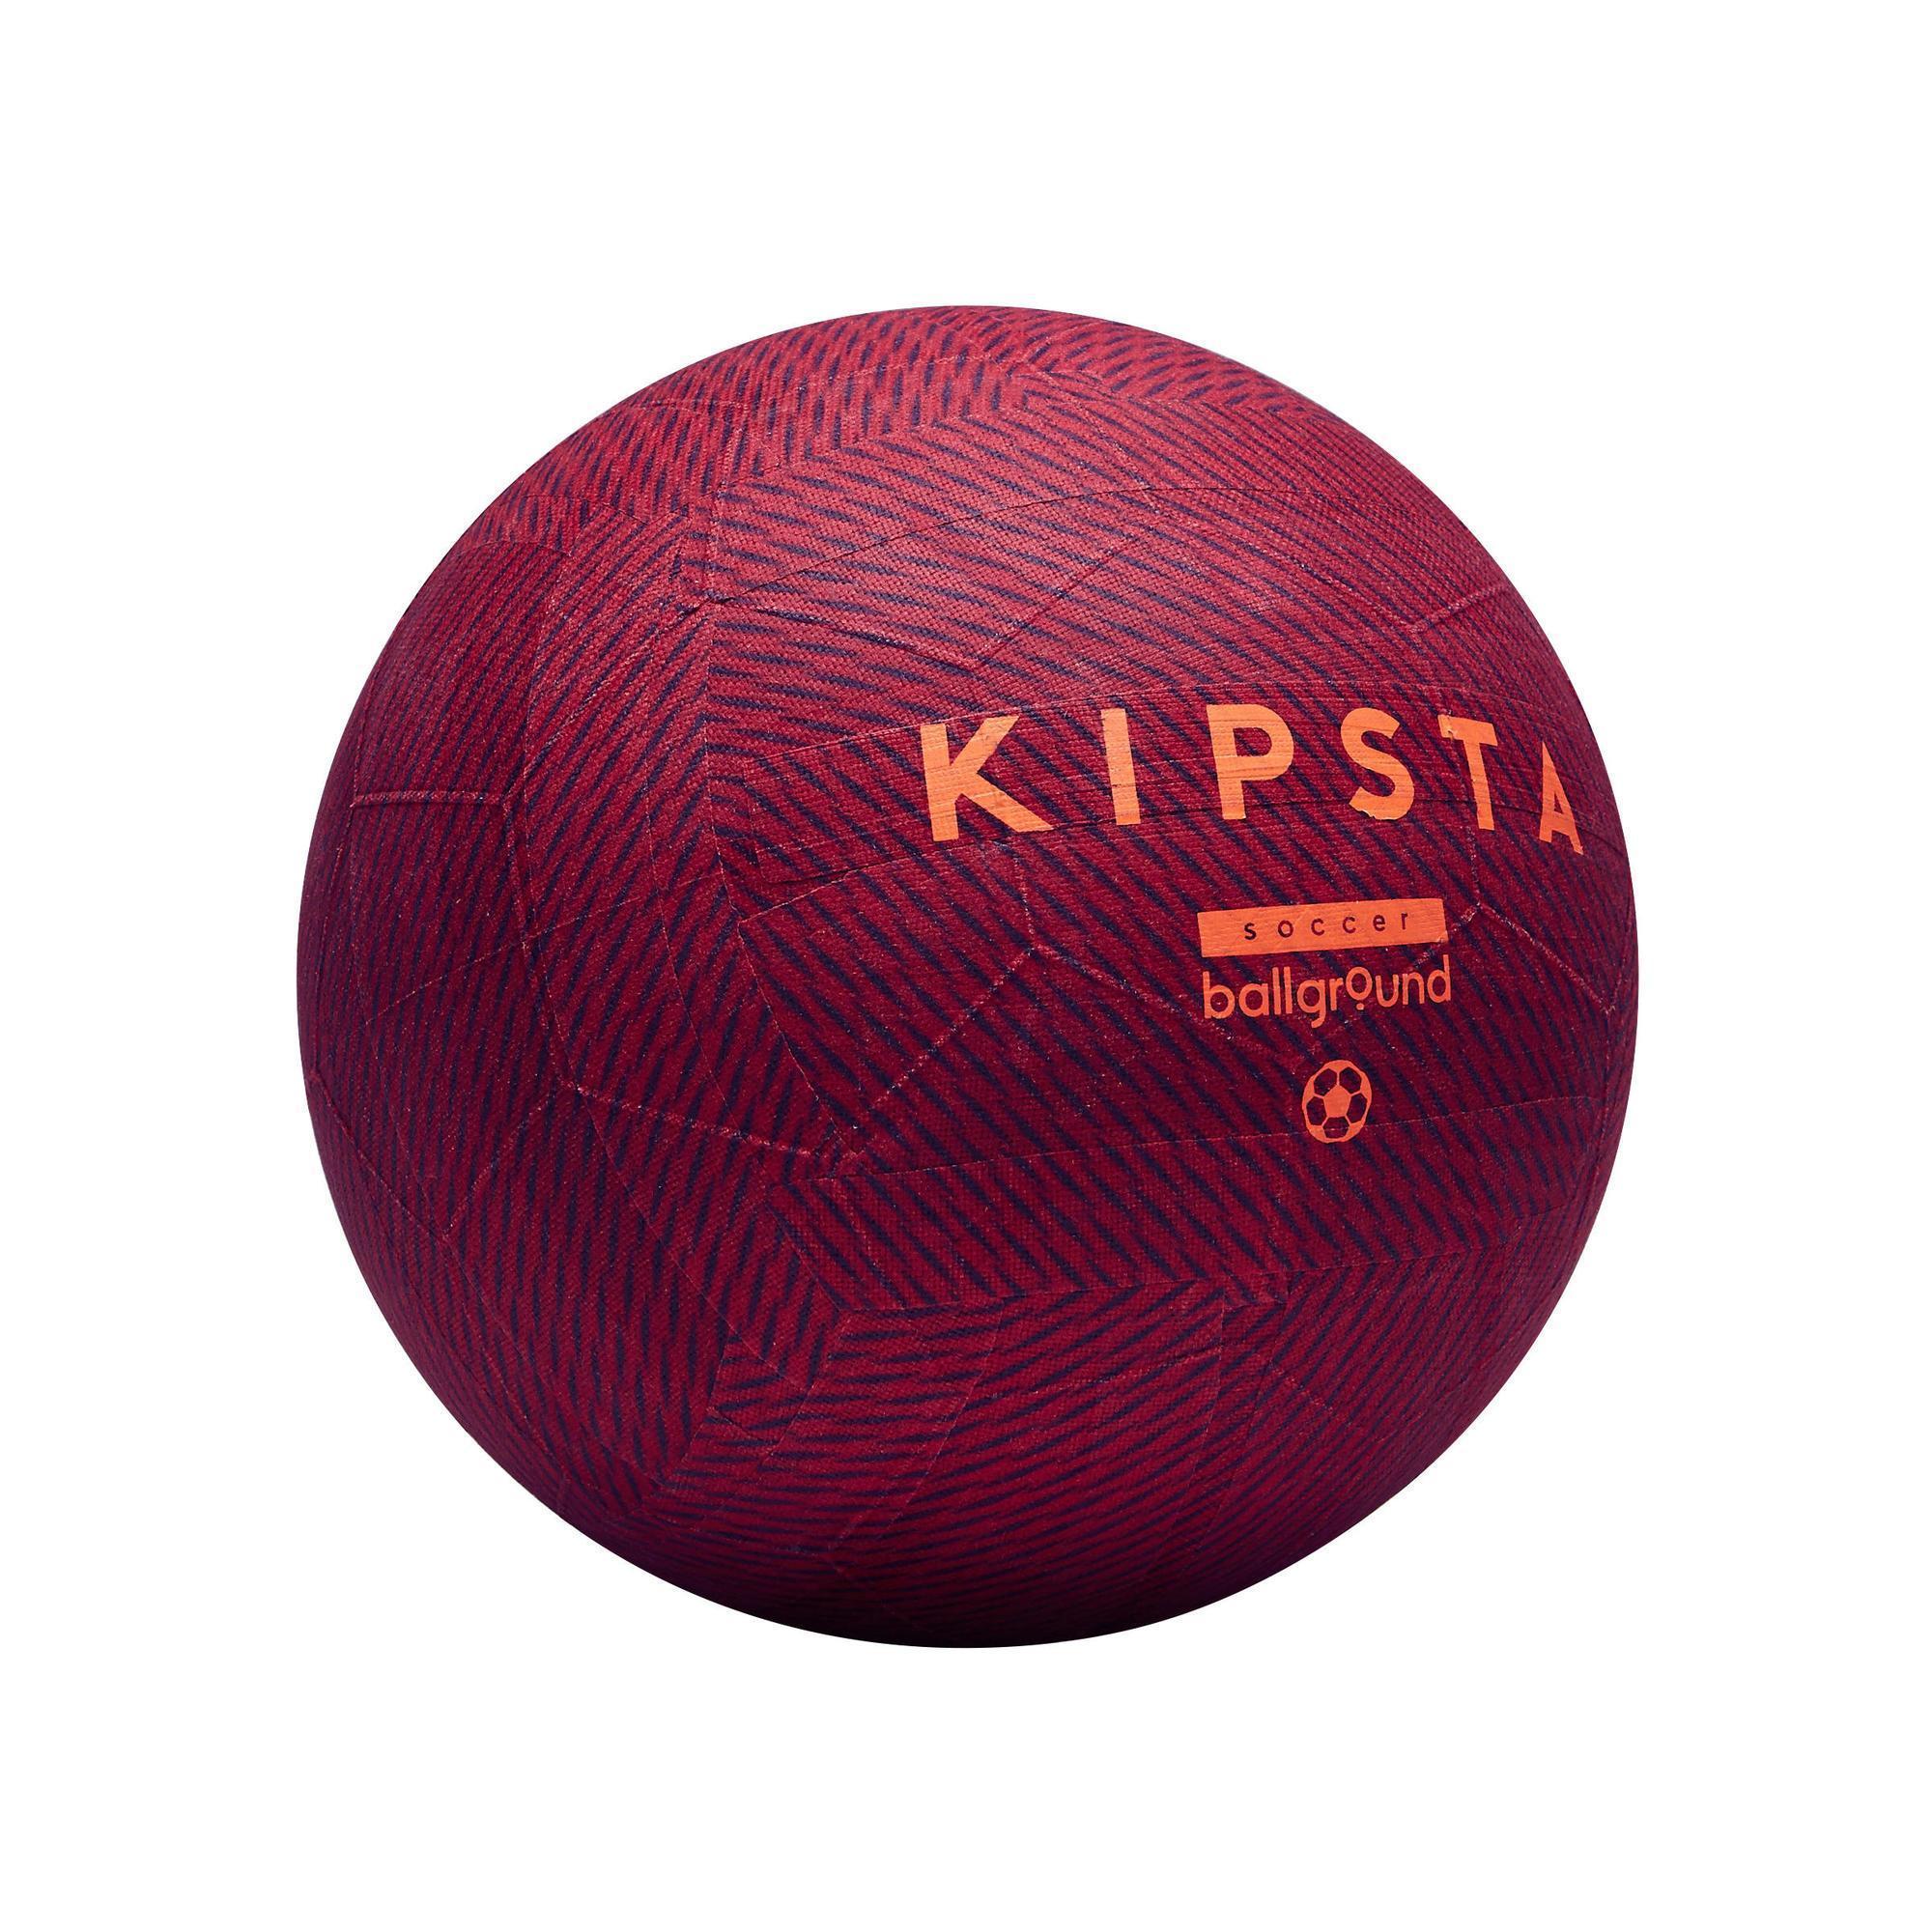 dcb04437e37 Comprar Balones de Fútbol Ocio y Pelotas Foam